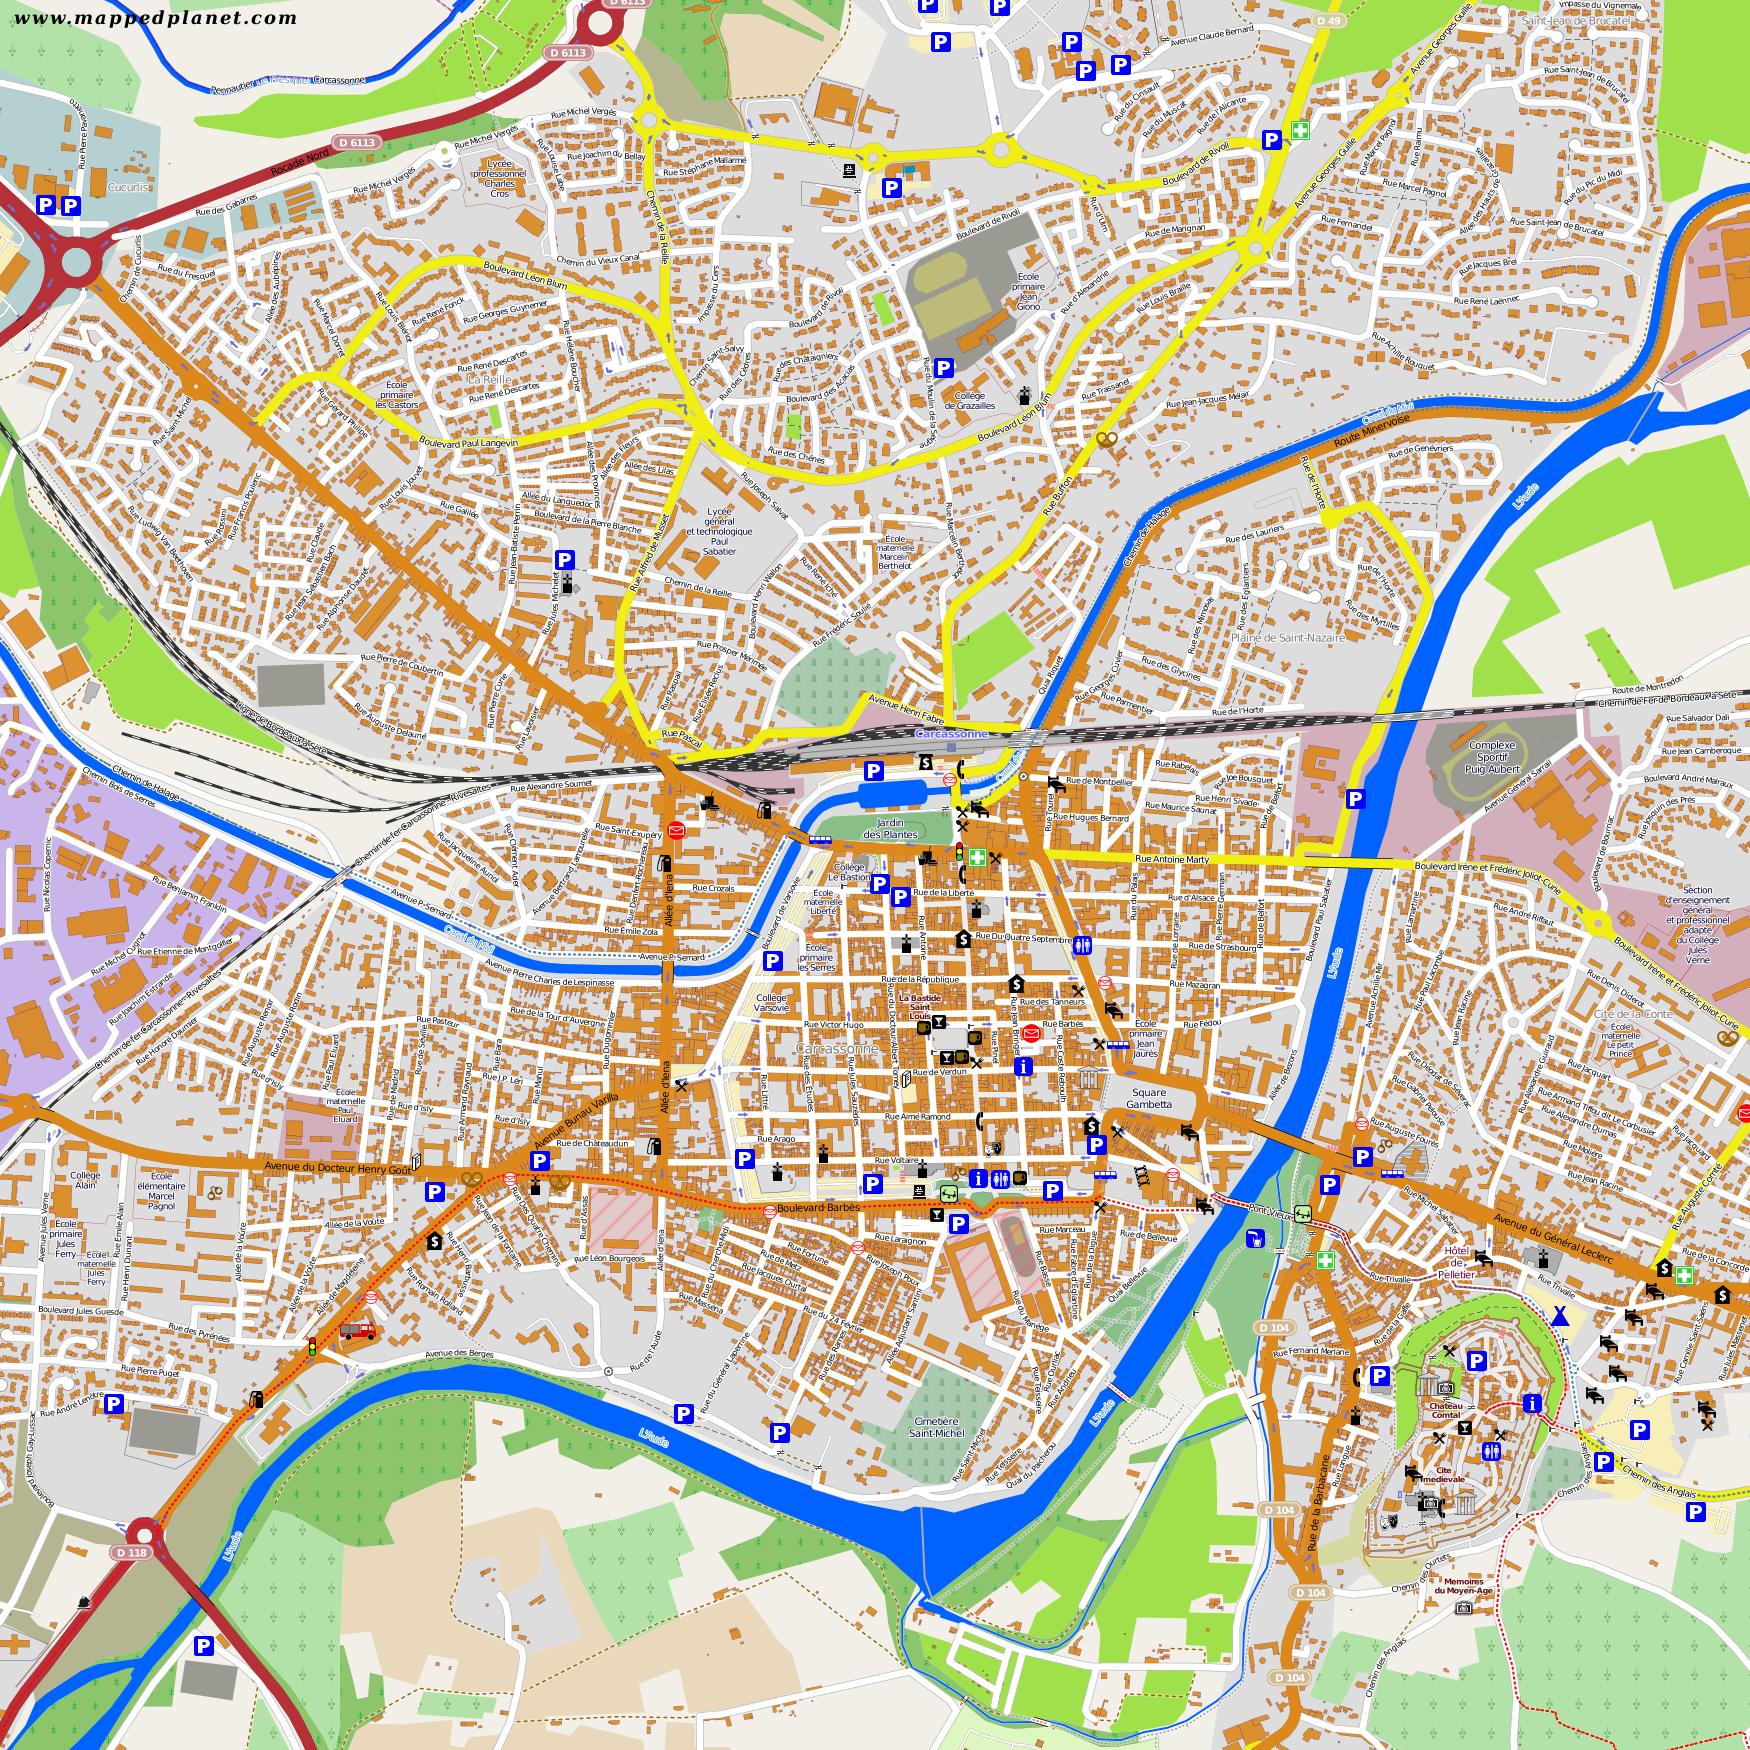 City Maps Carcassonne - Rue france map